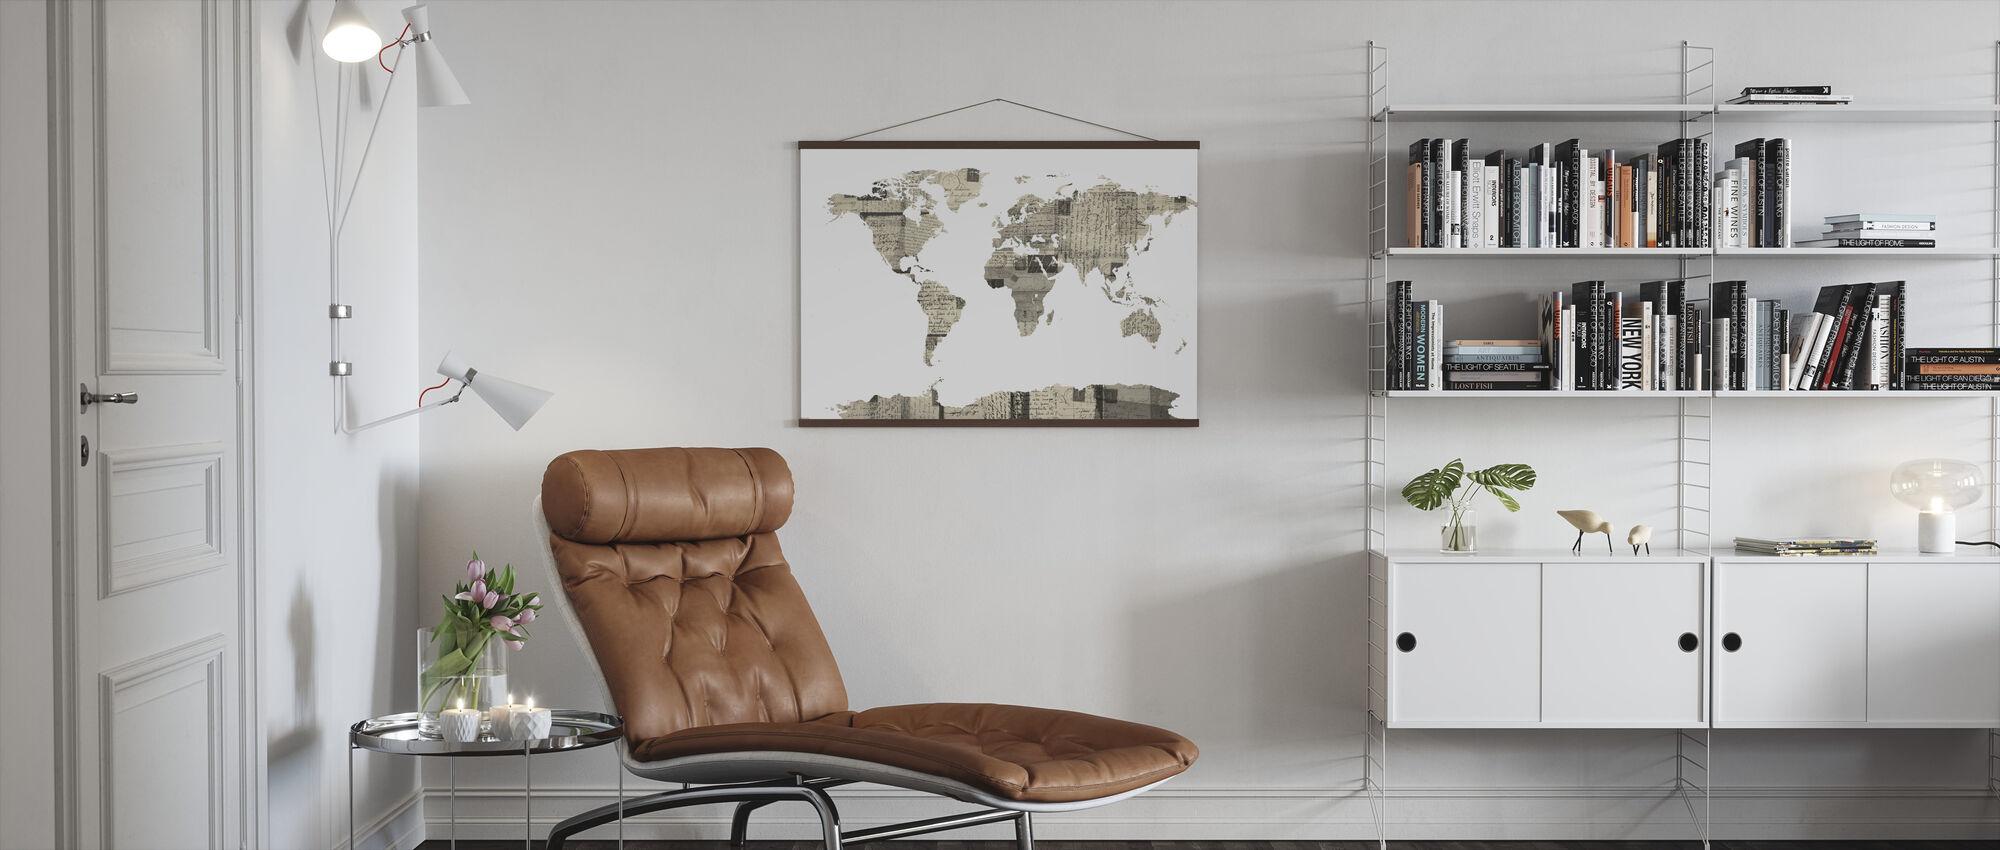 Old Postcards World Map - Poster - Living Room